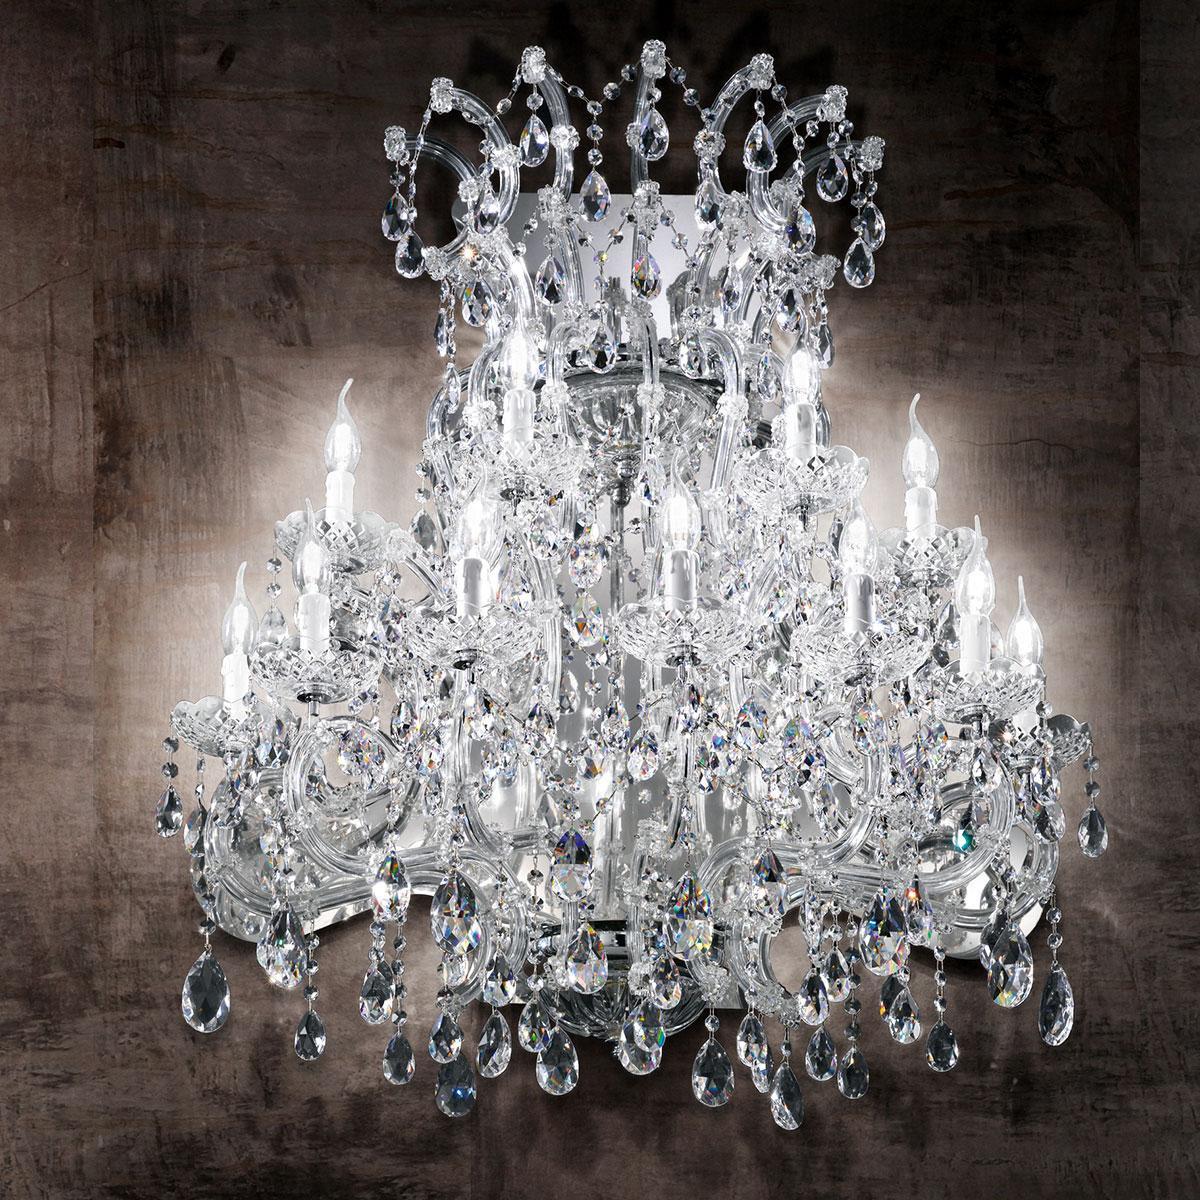 """Canaletto"" venezianischer kristall wandleuchte  - 11 flammig - transparent"